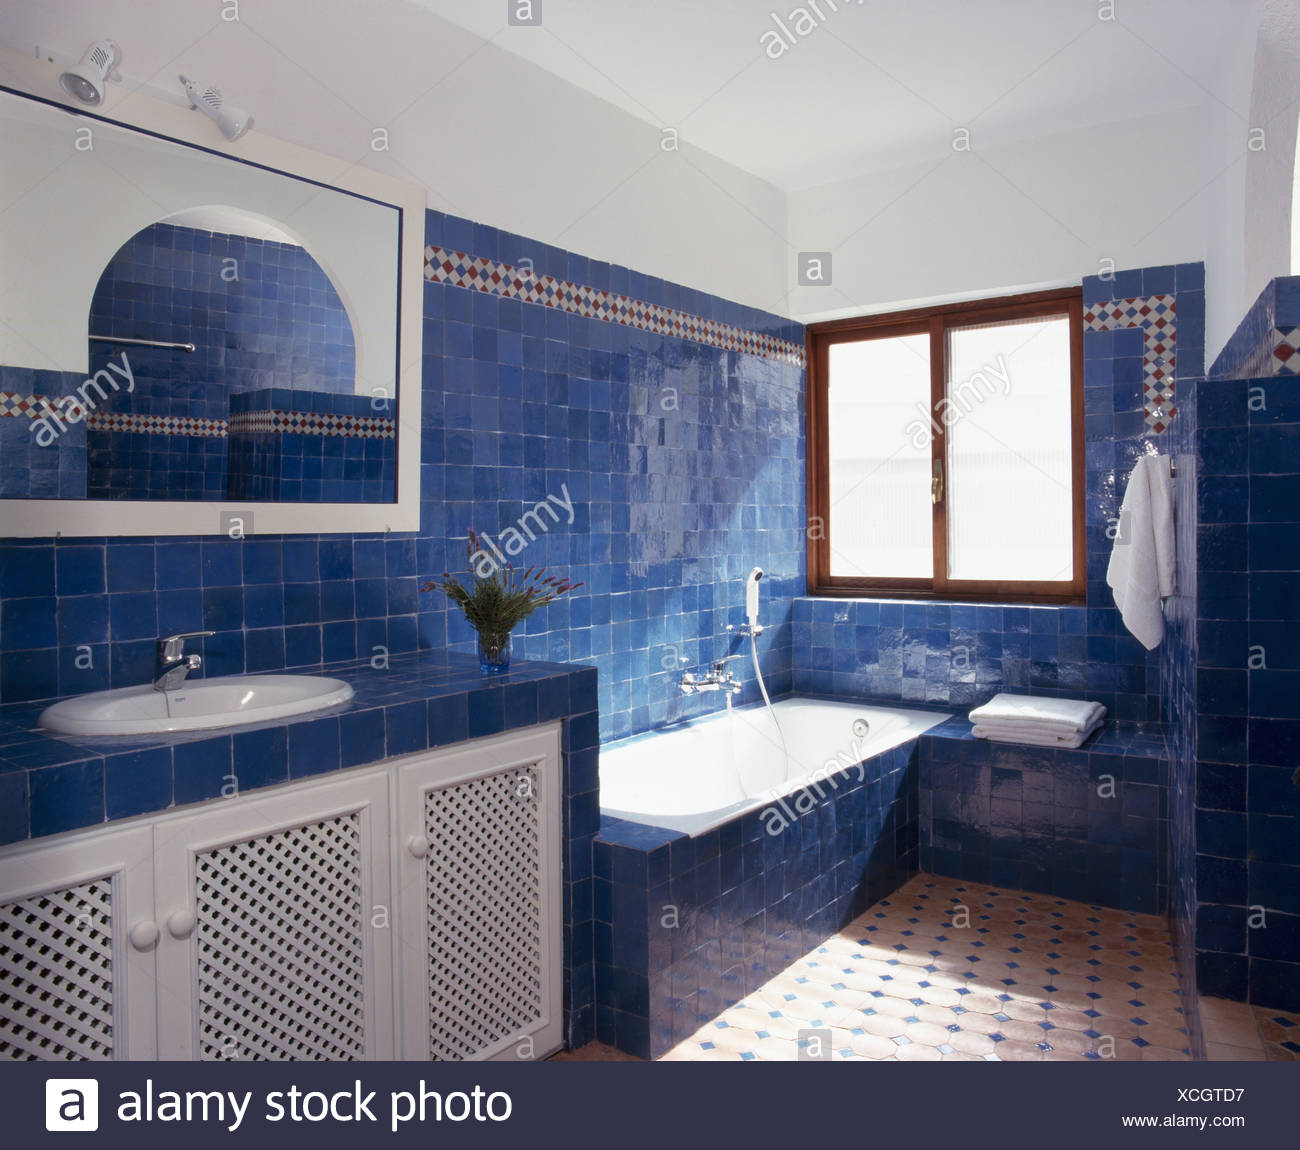 Badezimmer Blaue Fliesen